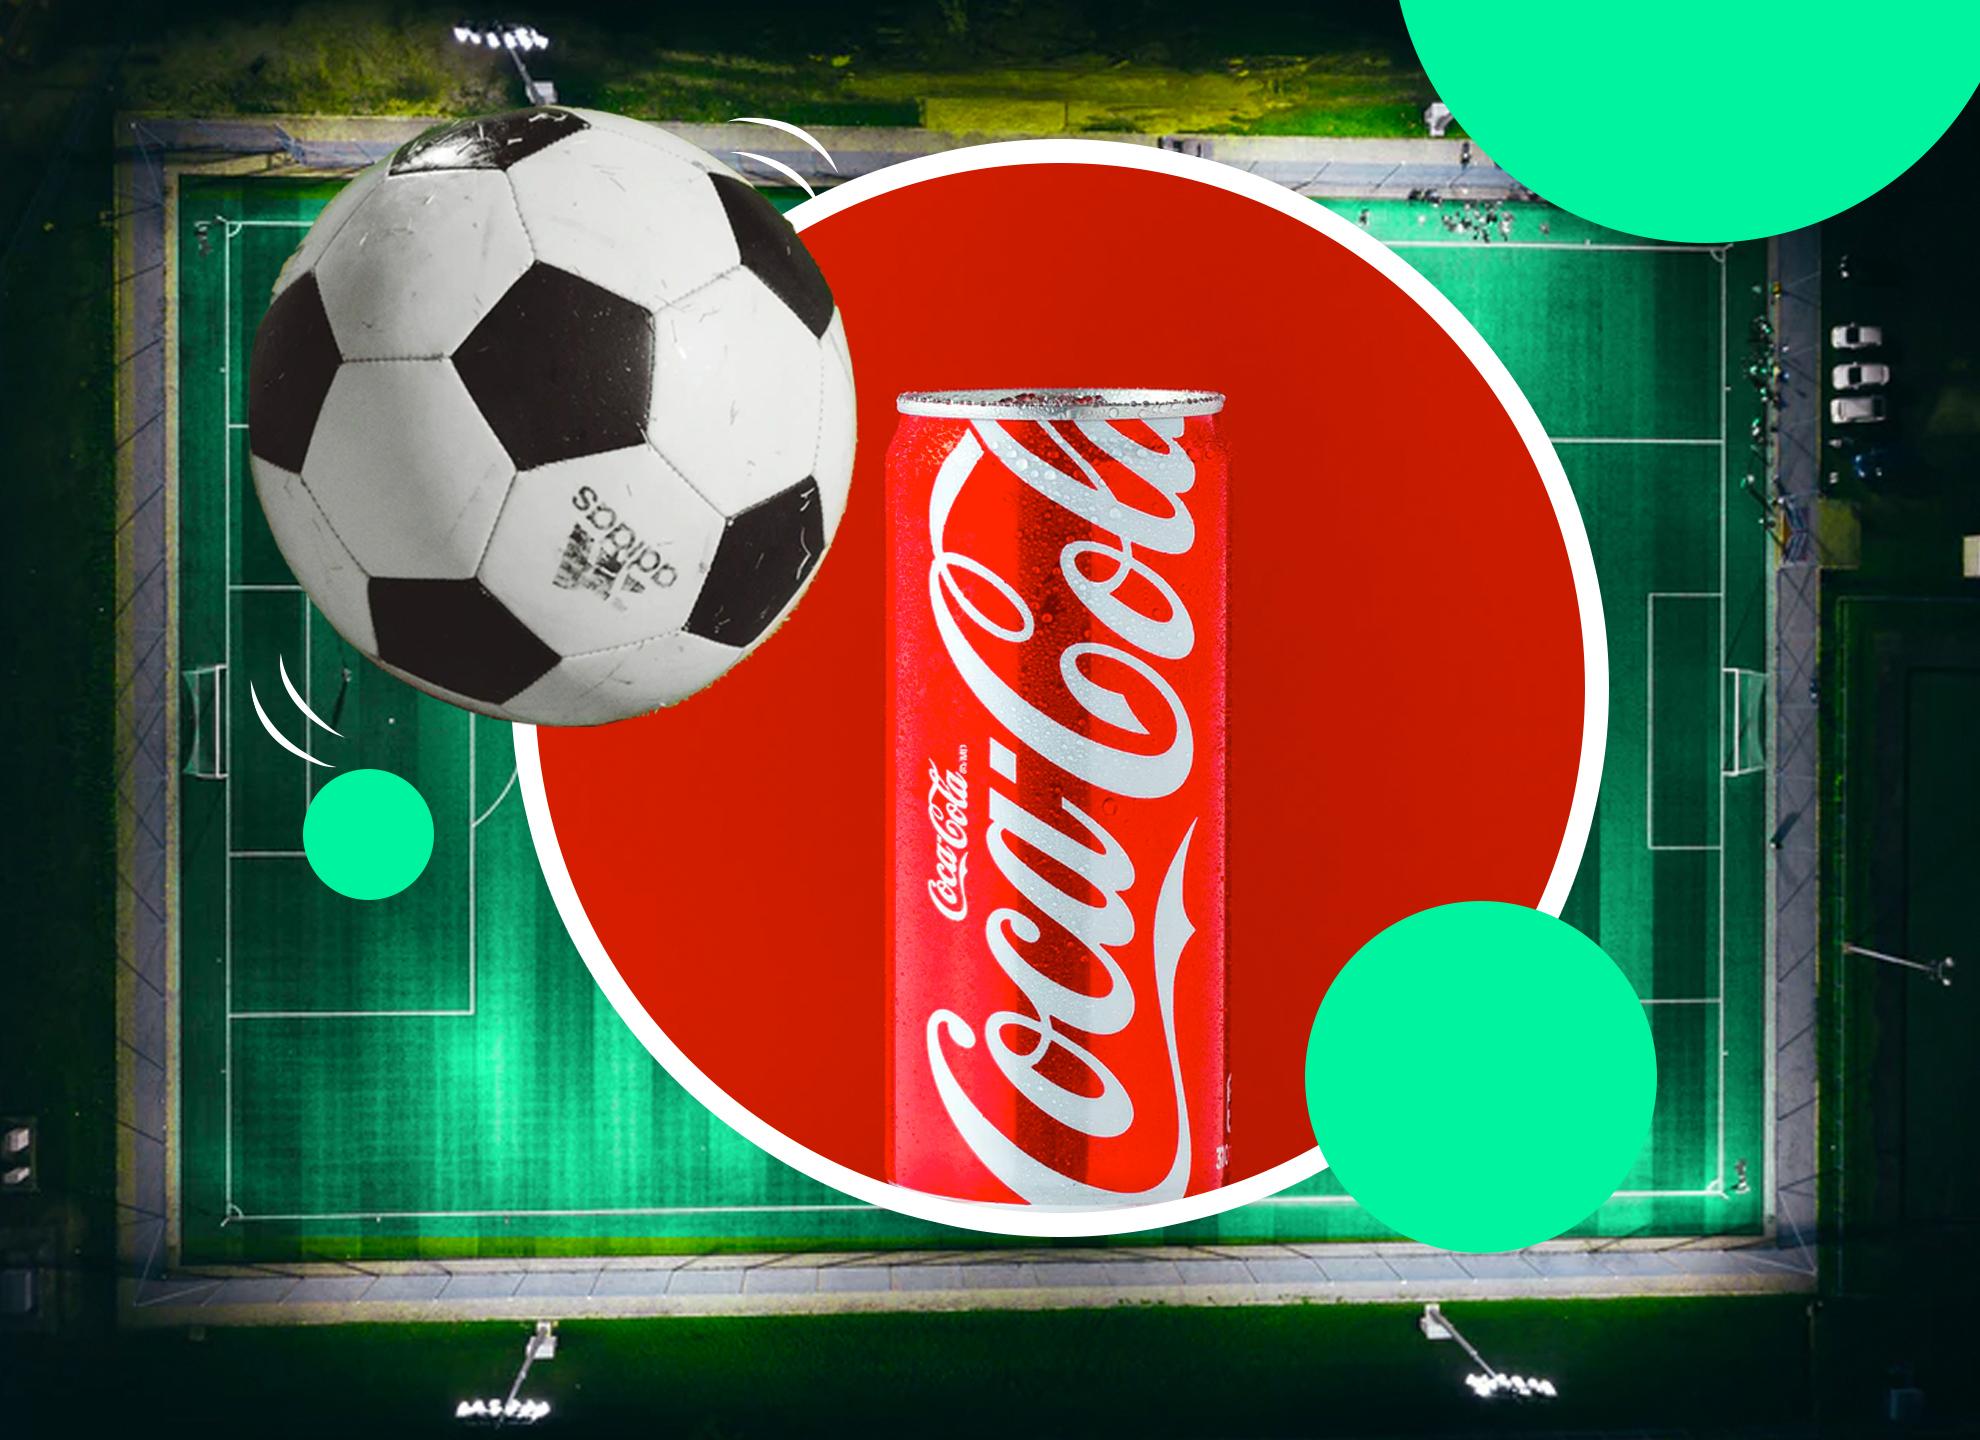 Brand Coca Cola and football's UEFA partnership